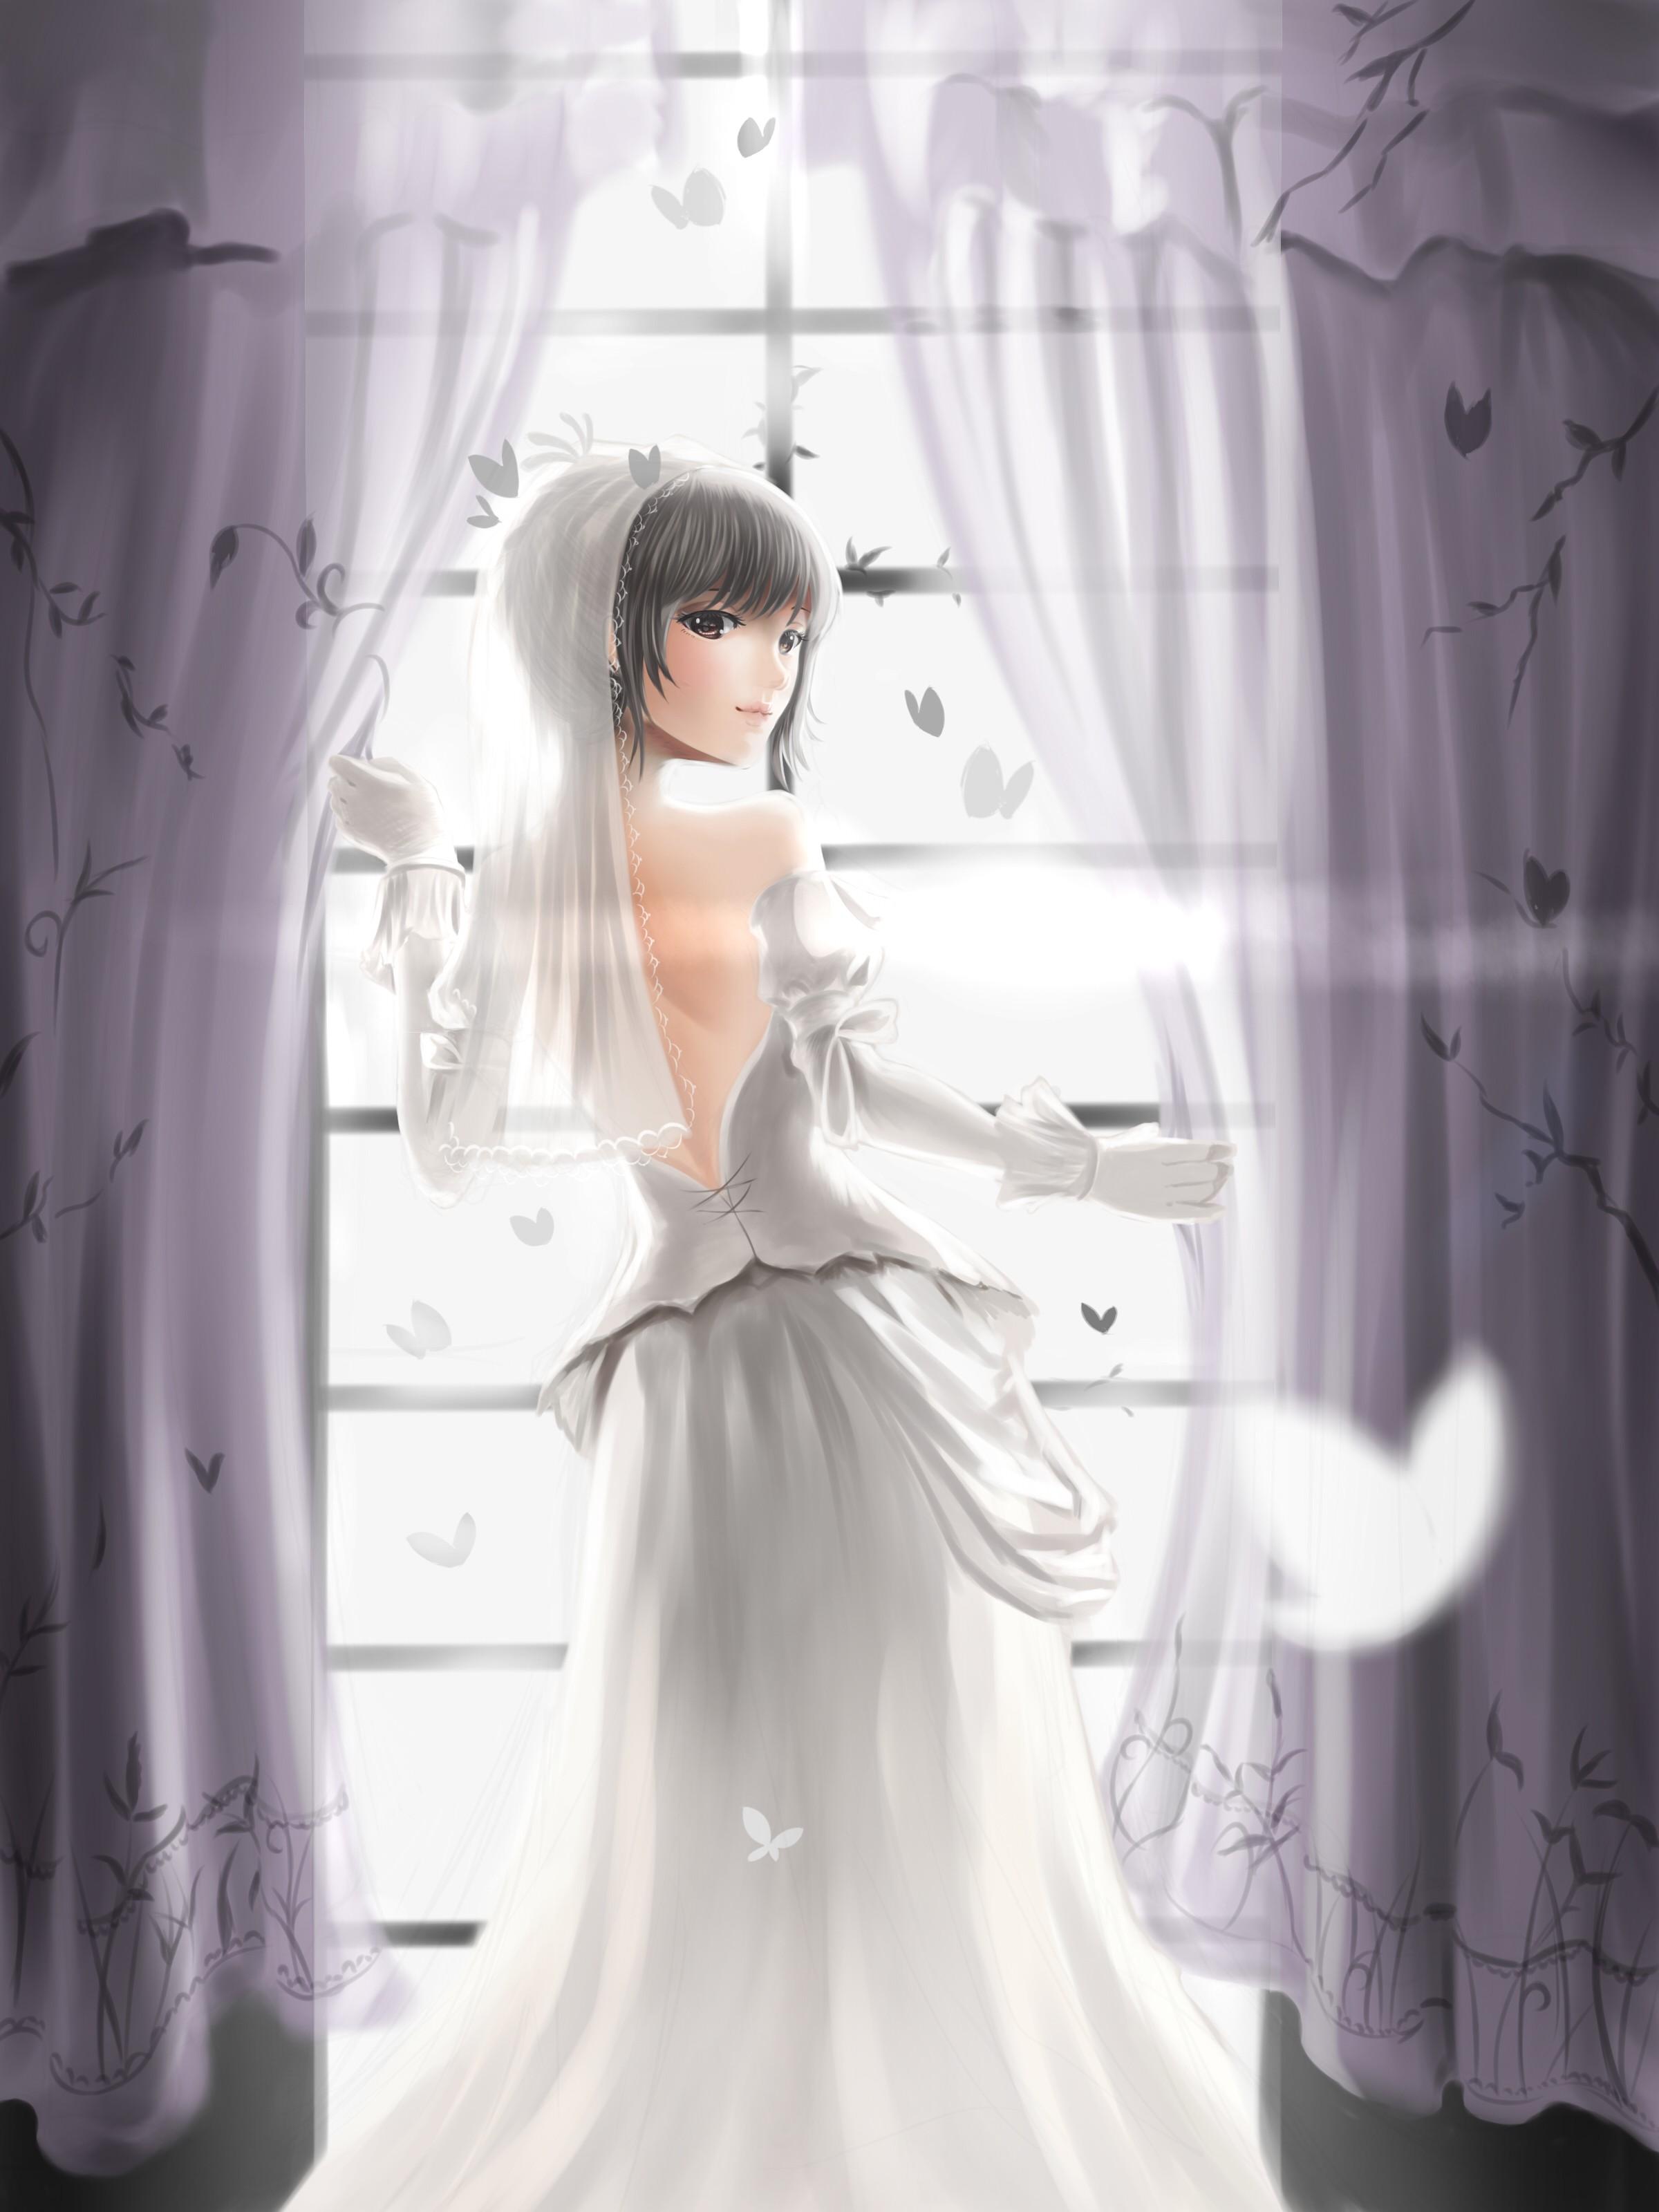 Wallpaper Anime Girls Short Hair Wedding Dress Woman Bride - Anime Wedding Dress